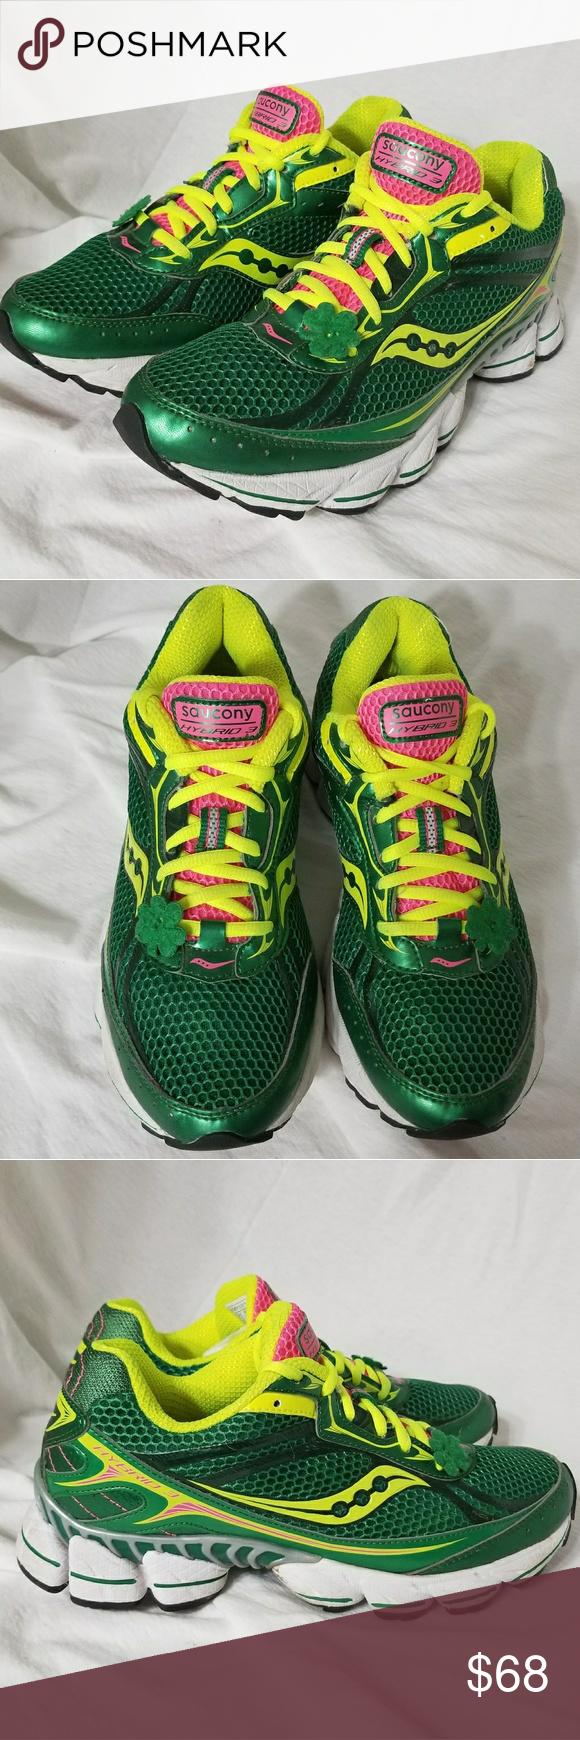 d06f58c1 SAUCONY Szv 8.5 Shamrock Hybrid 3 Shoes Brand: Saucony Item: *Size ...